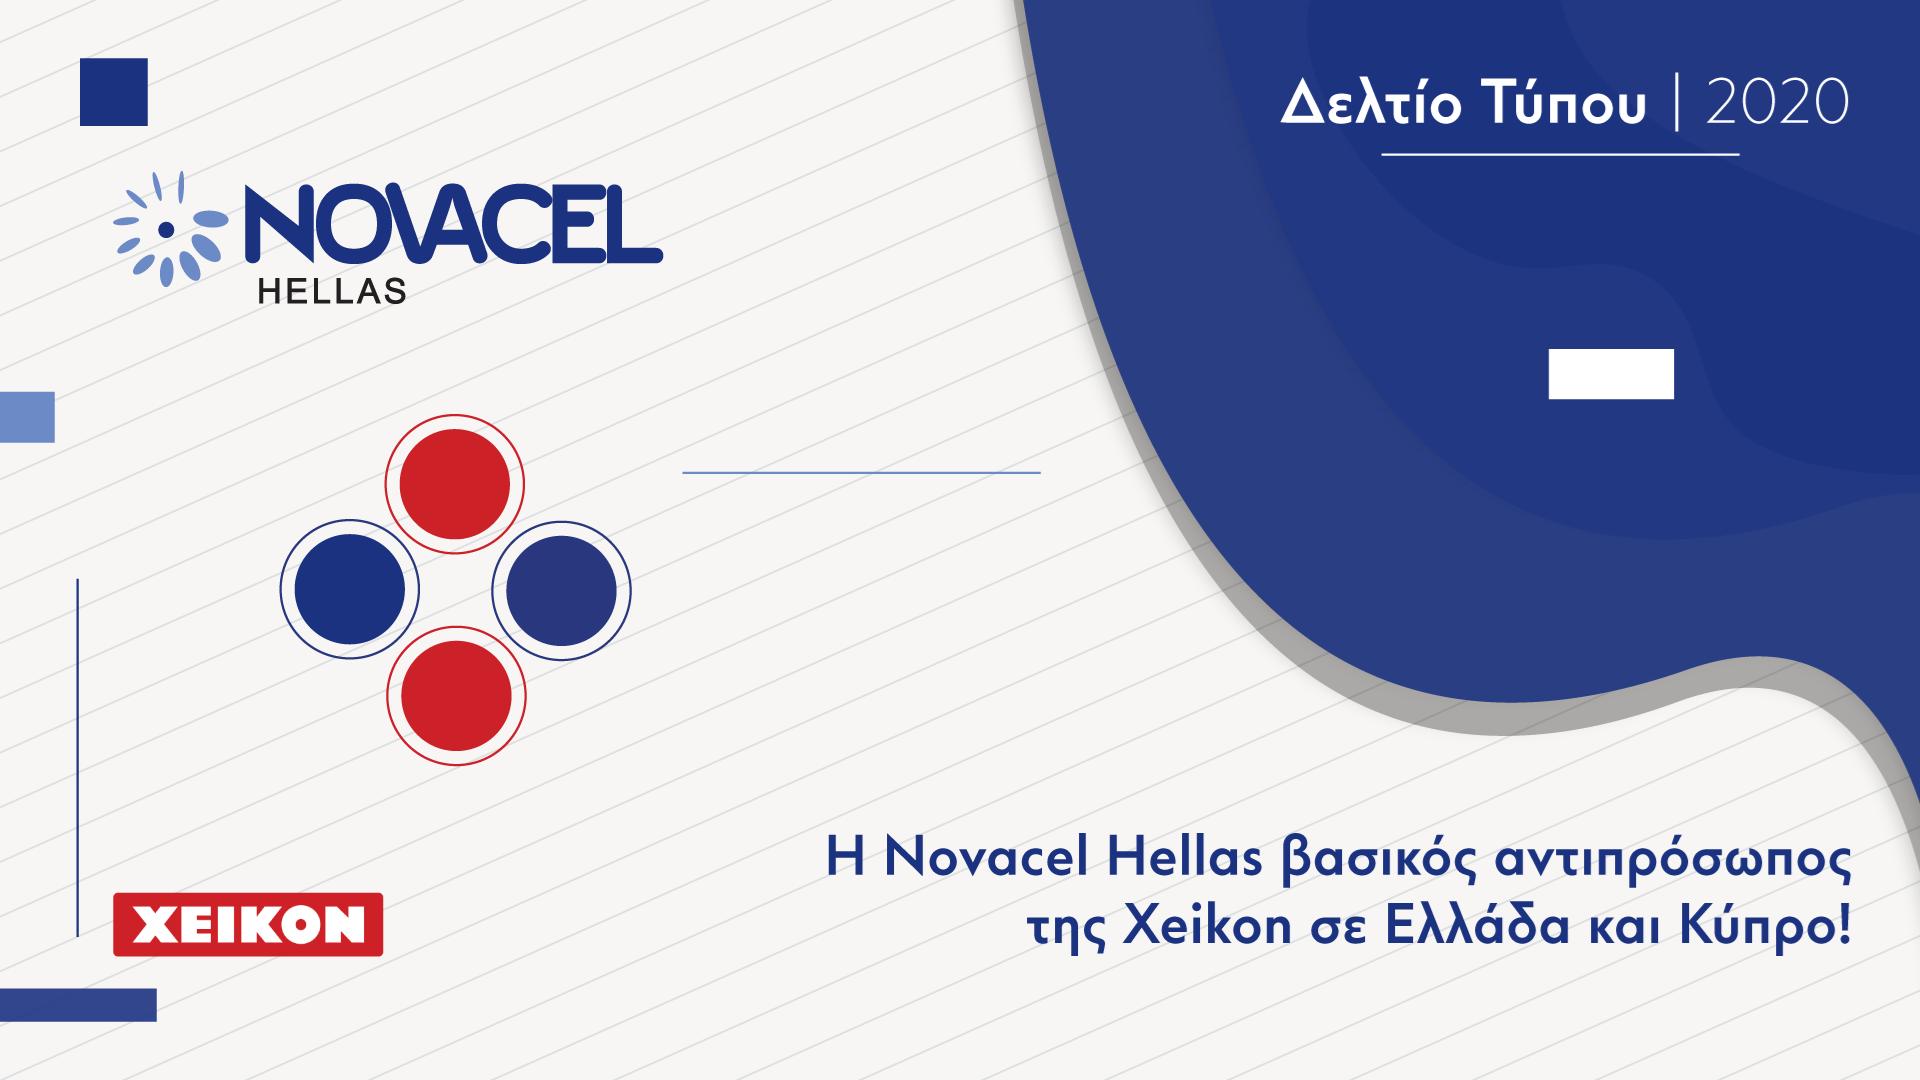 Novacel Hellas και Xeikon σε μία συνεργασία που ενδυναμώνει την παρουσία και των δύο εταιρειών σε Ελλάδα και Κύπρο